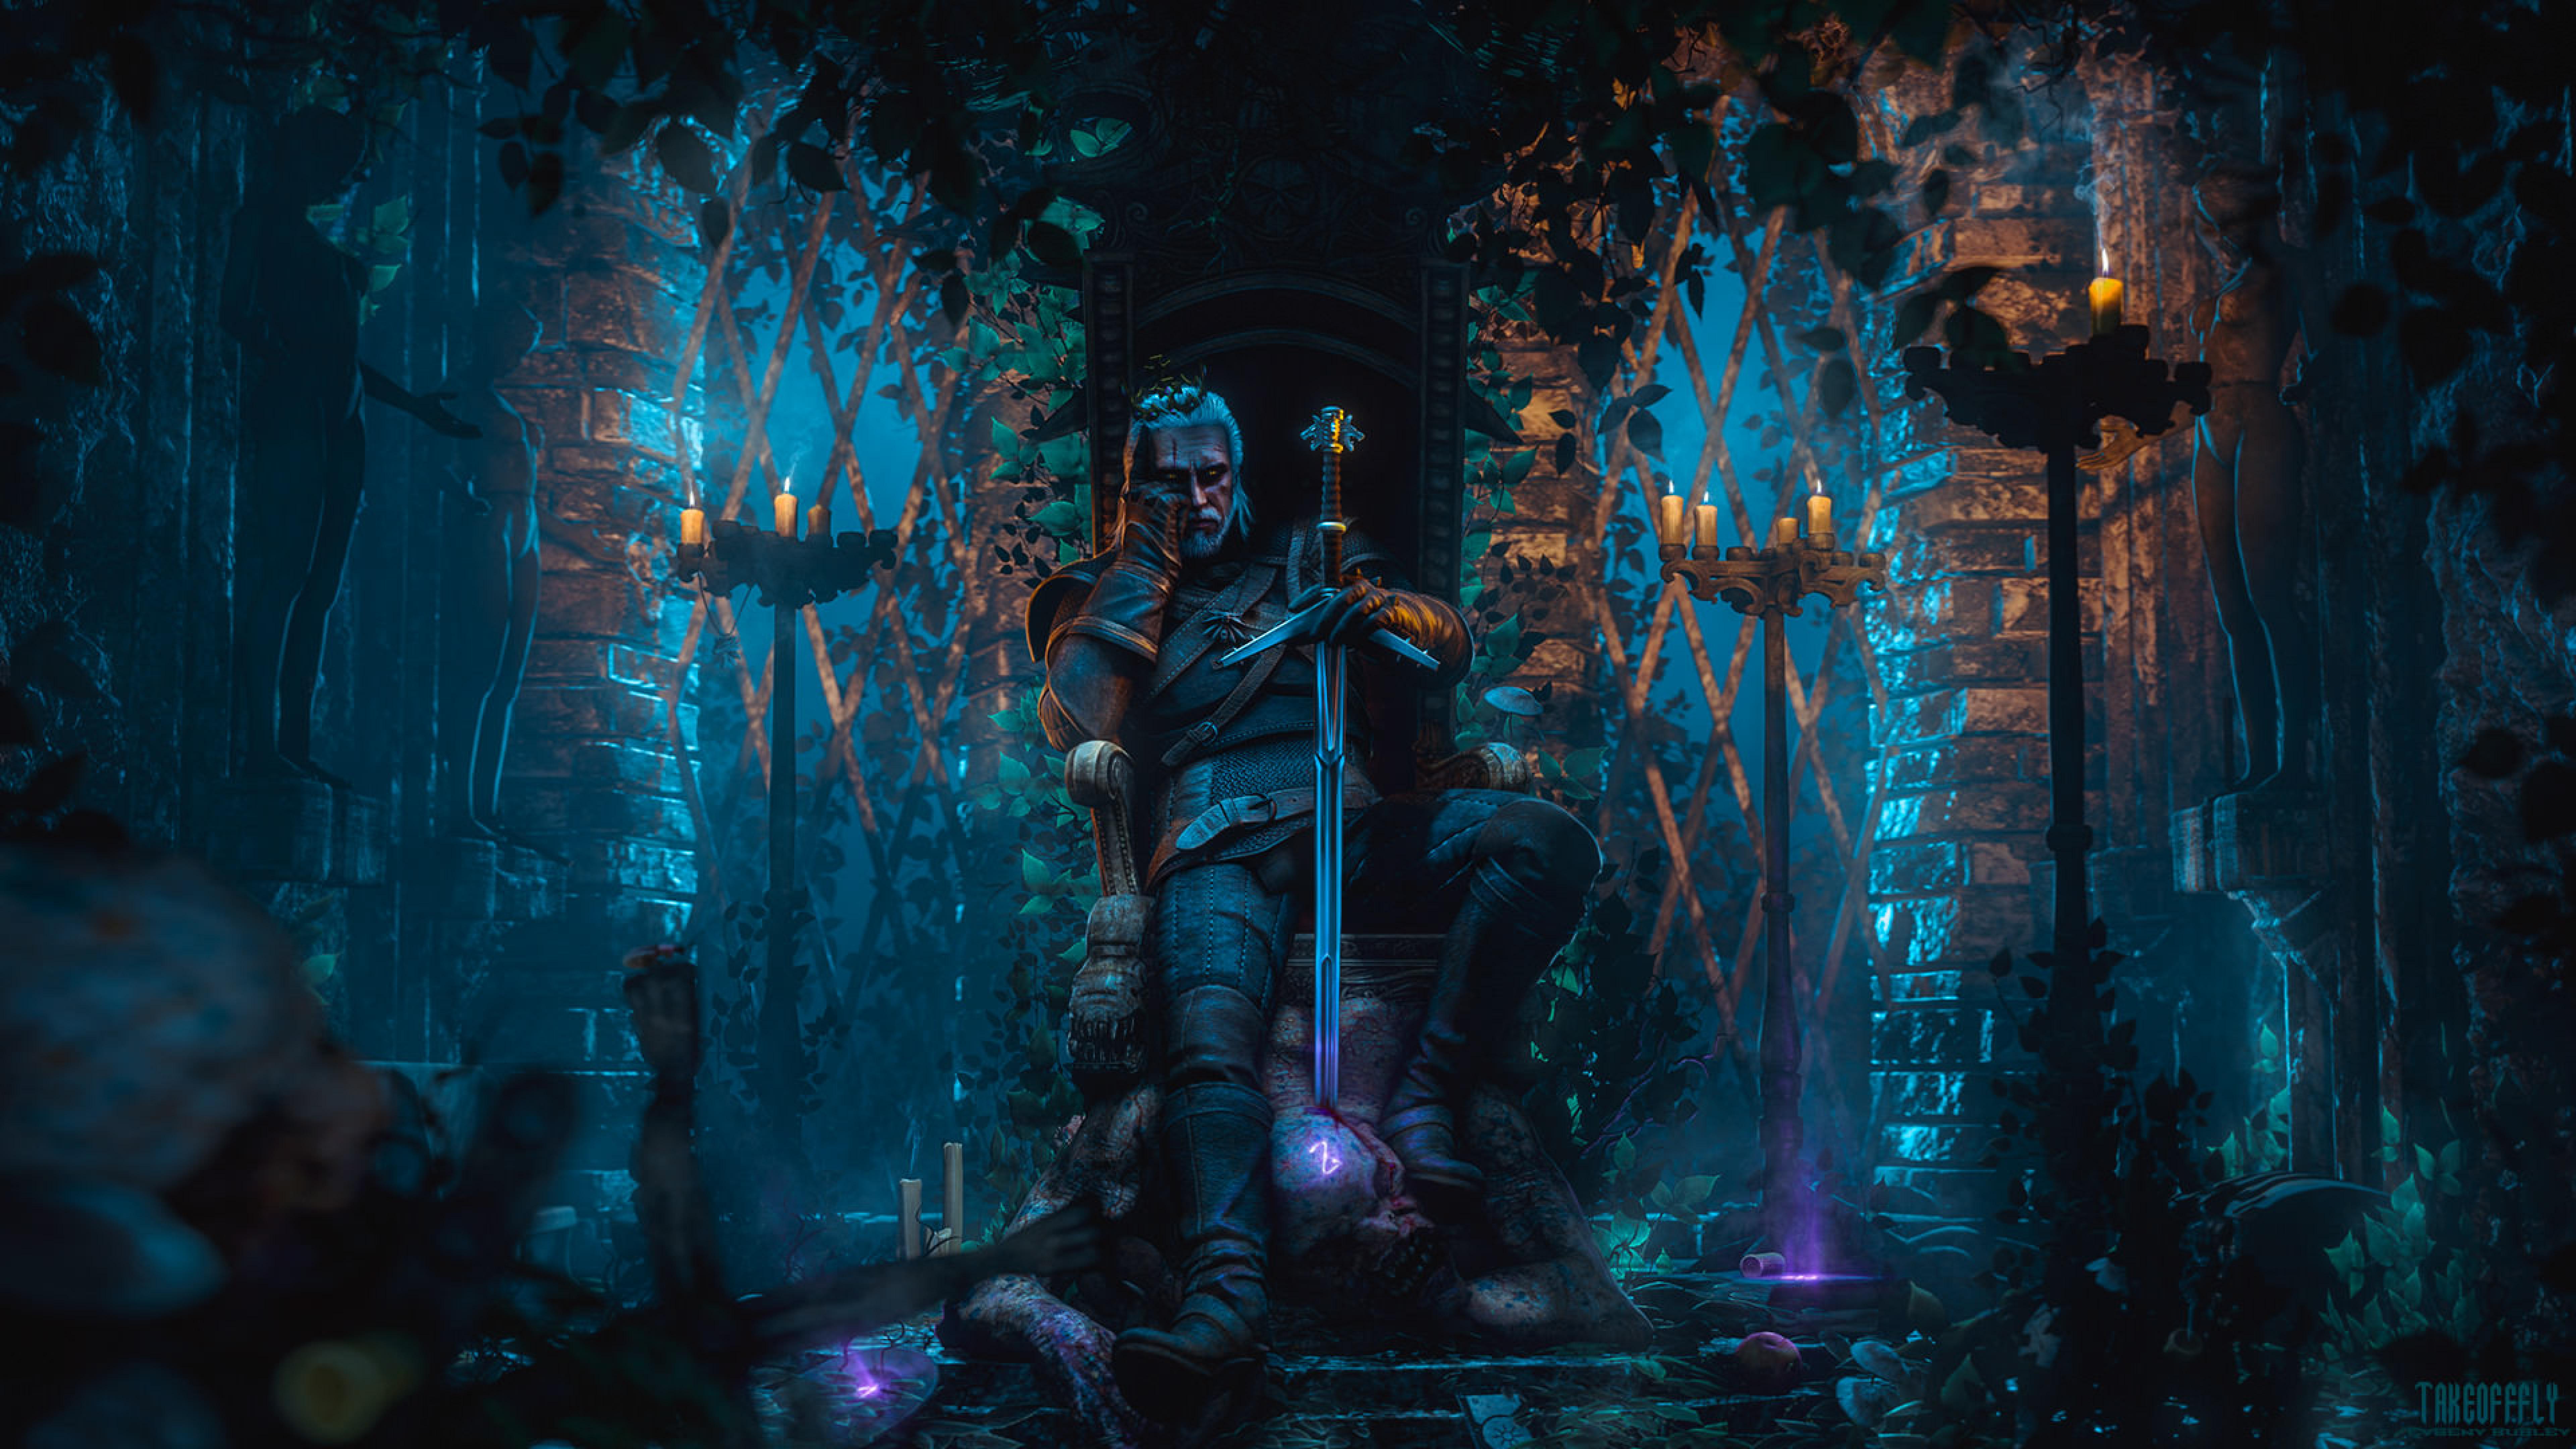 7680x4320 Geralt Of Rivia The Witcher 3 8k Wallpaper Hd Games 4k